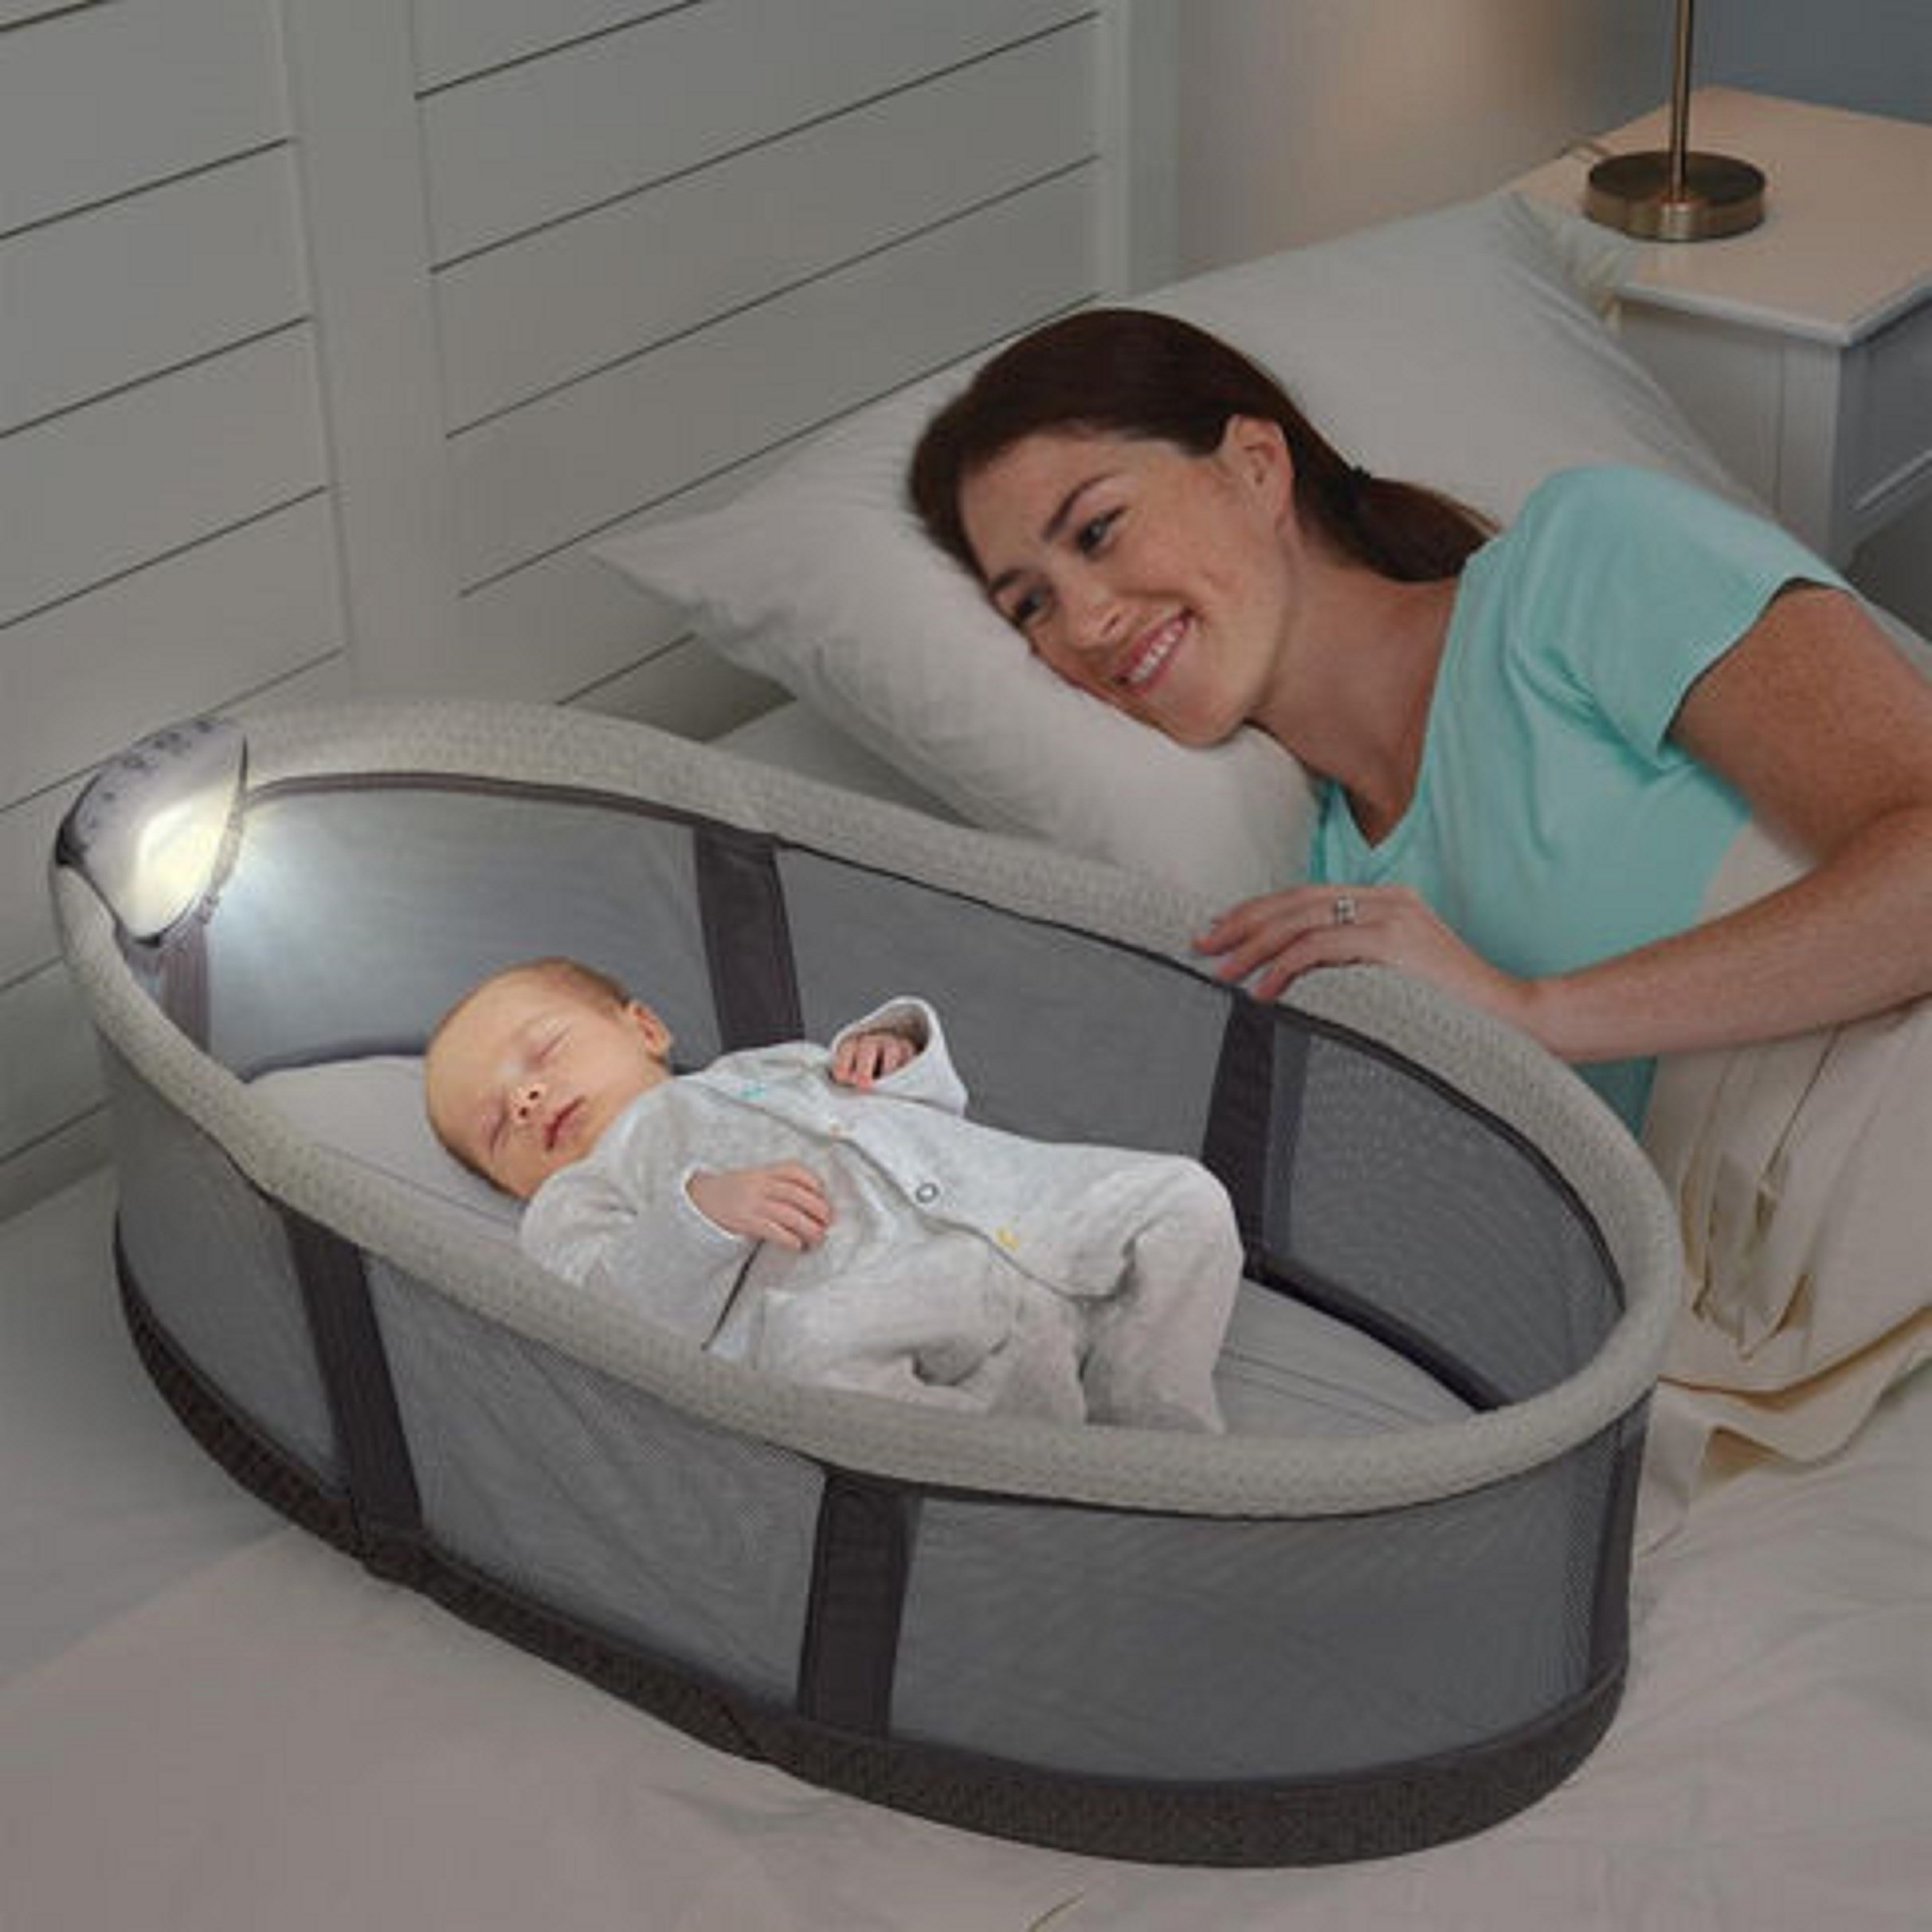 Serta iComfort Infant Sleeper, Gray